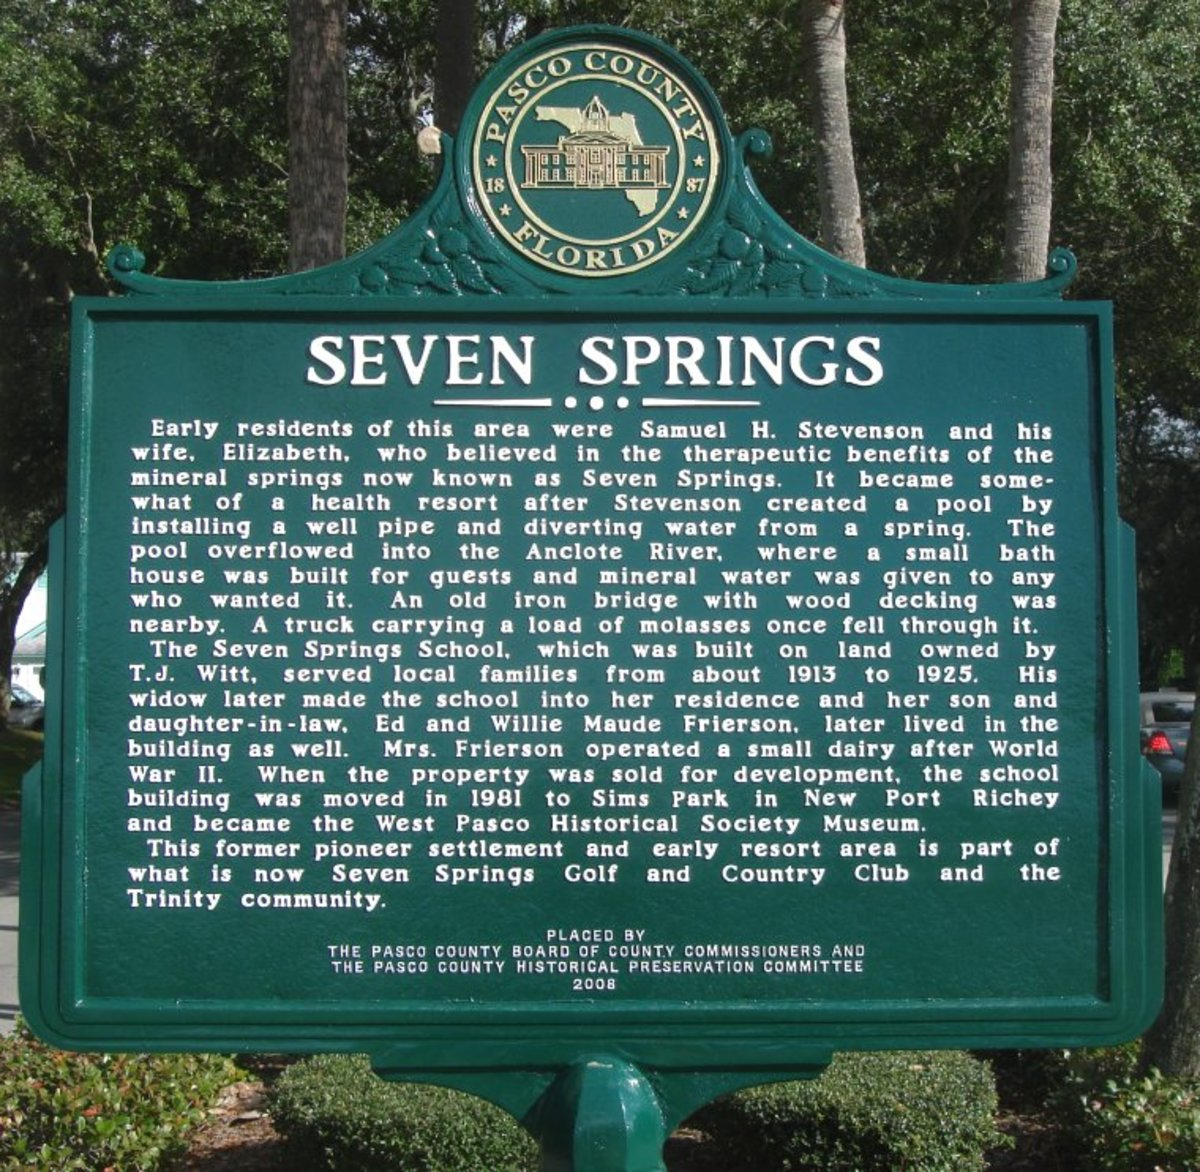 The Seven Springs historical marker